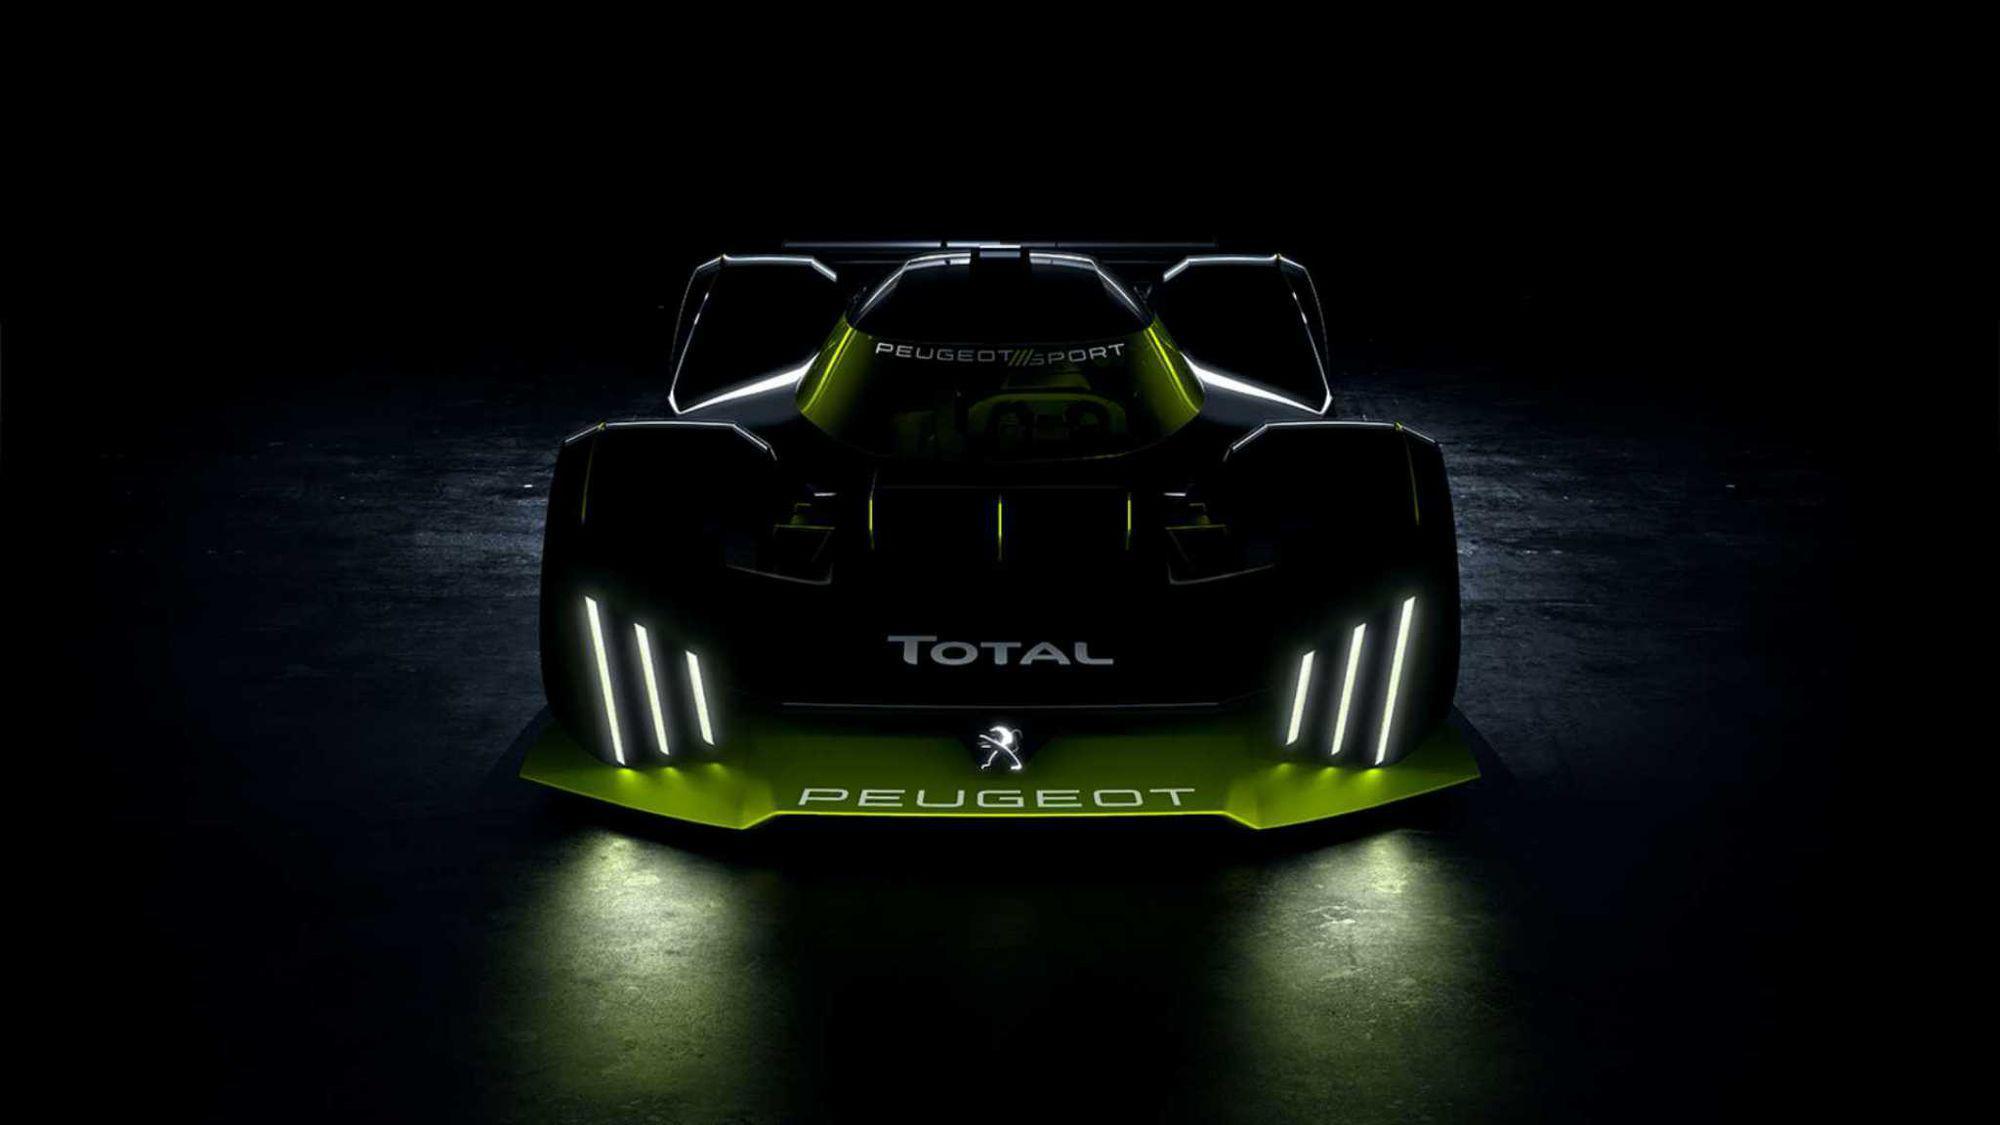 Peugeot va înscrie la Le Mans 24h un nou model. Va avea 680 CP